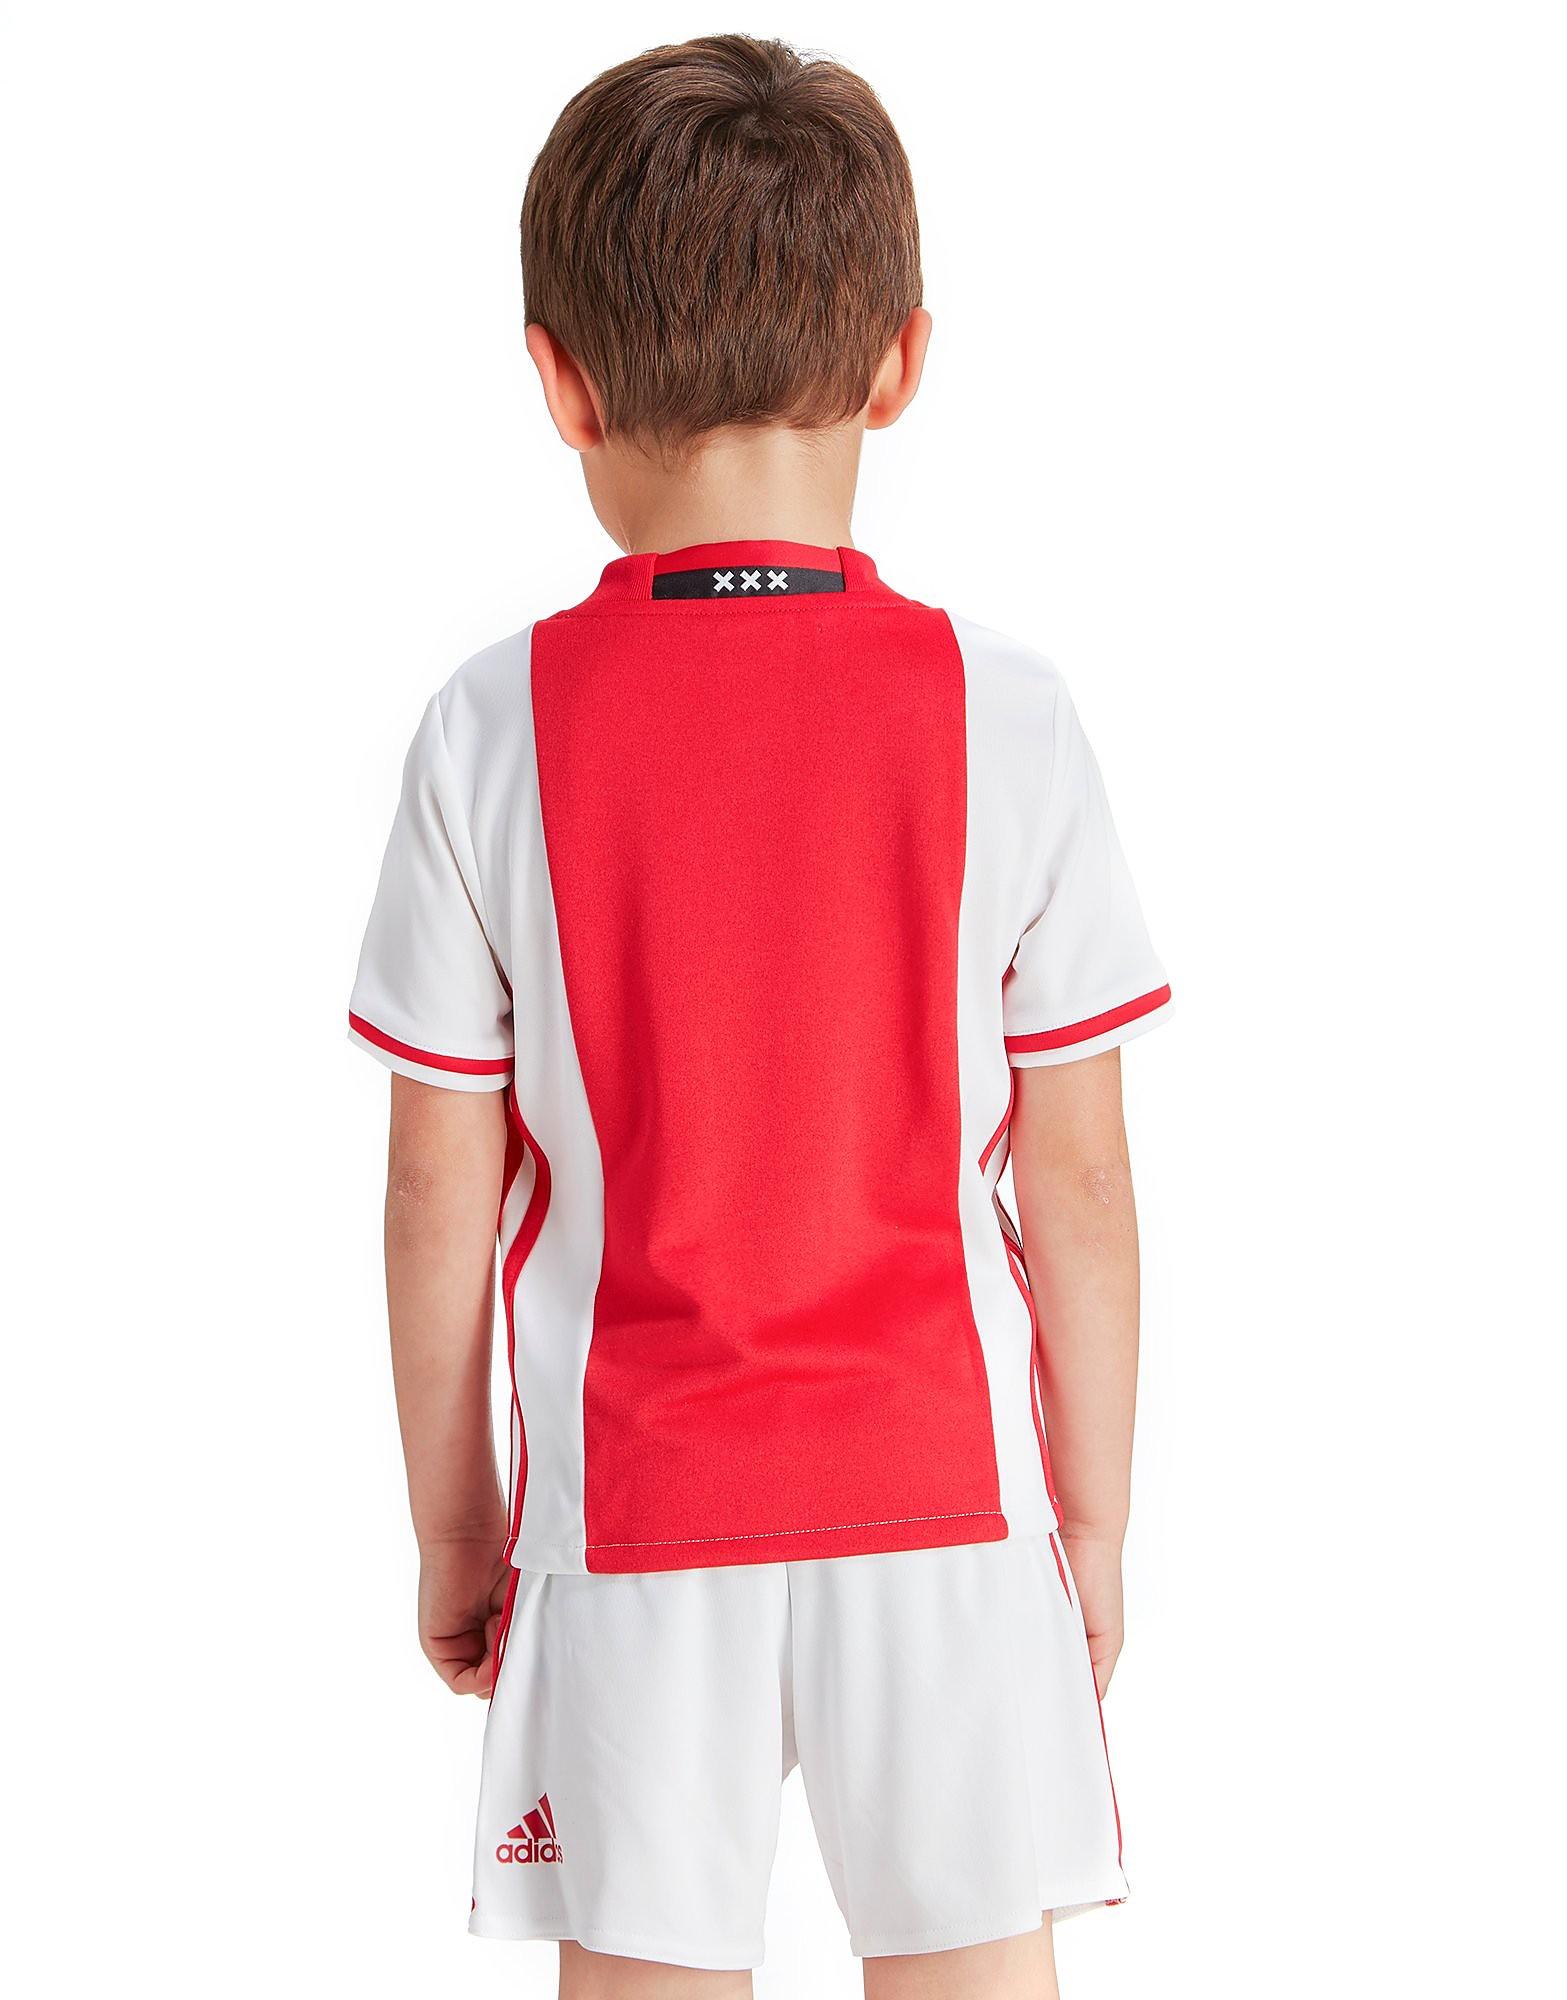 adidas Ajax 2016/17 Home Kit Children